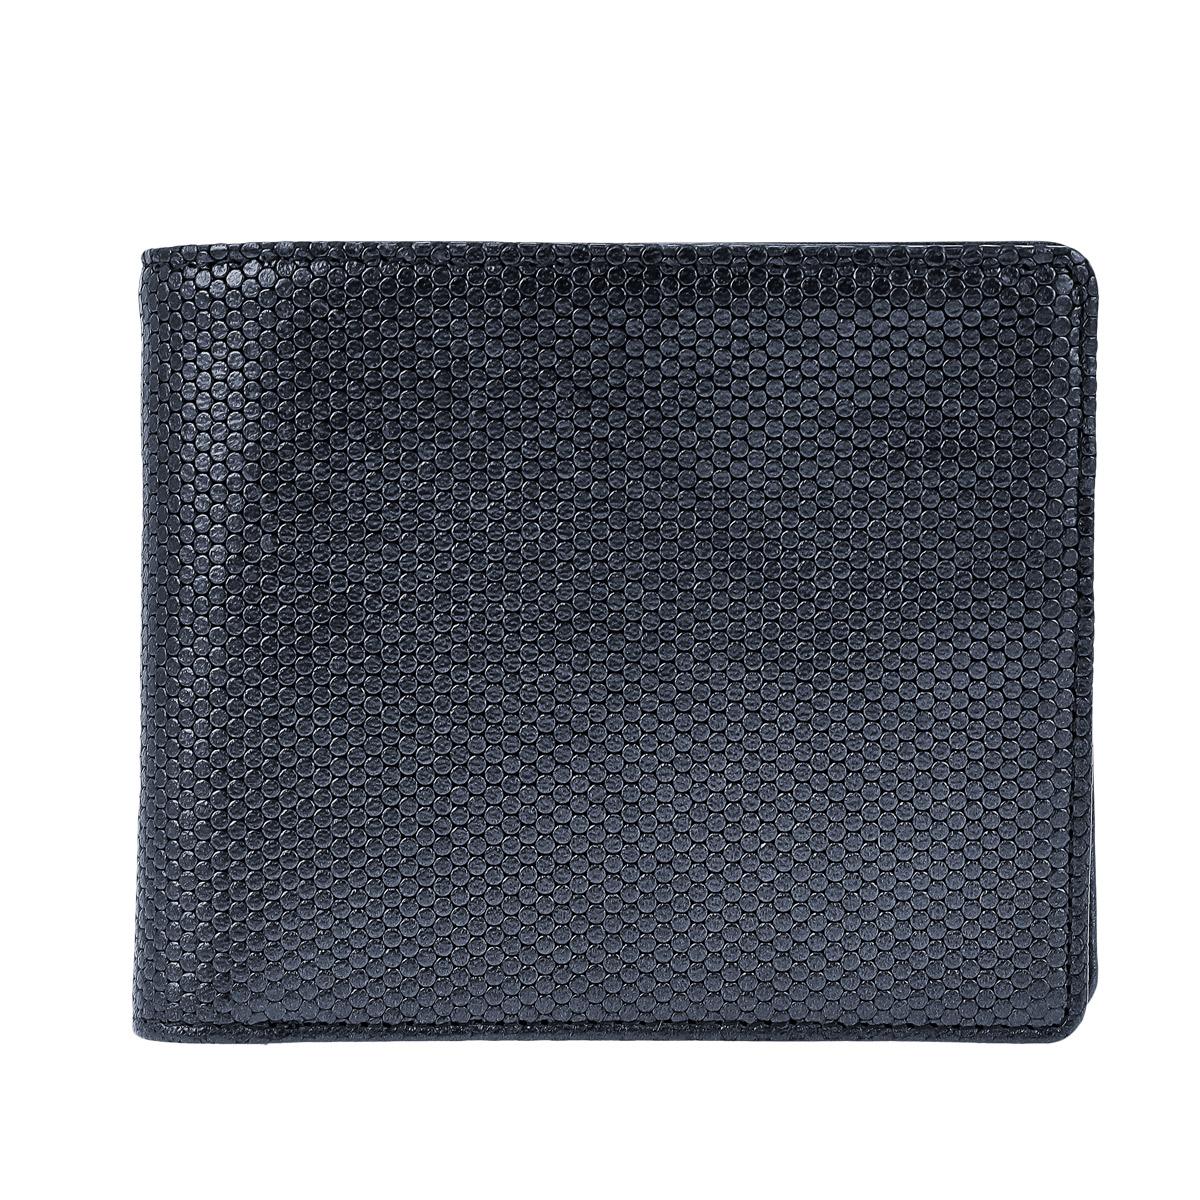 SONNE CHIP STAR WALLET ゾンネ 財布 二つ折り メンズ グレー ネイビー ブラウン SOI003A